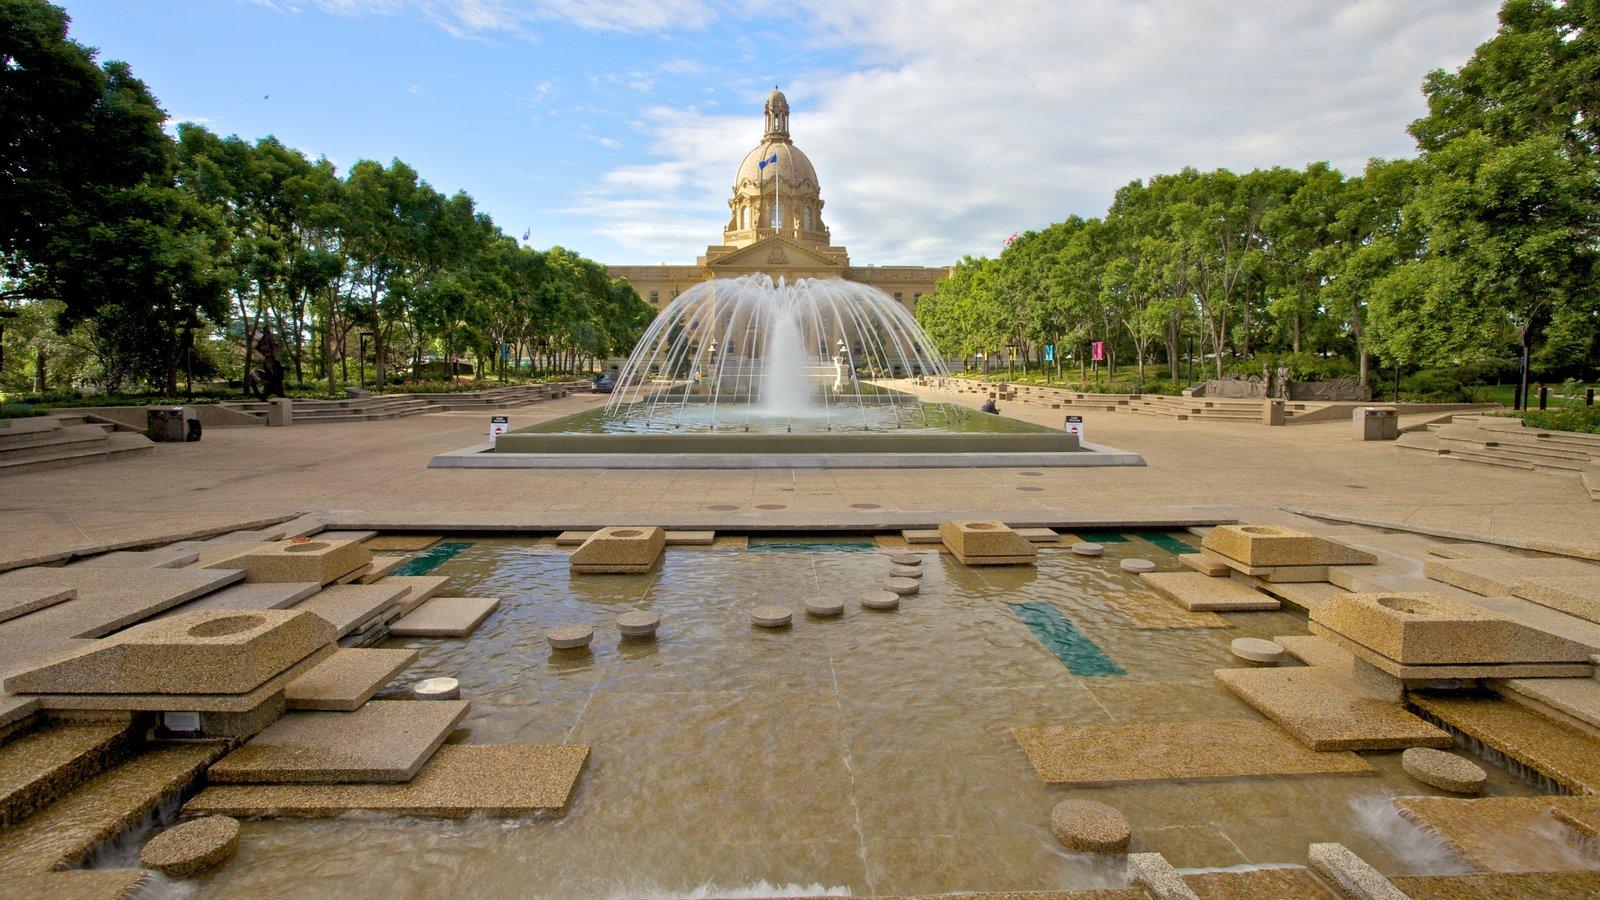 Alberta Legislature Building featuring heritage architecture, a square or plaza and a fountain